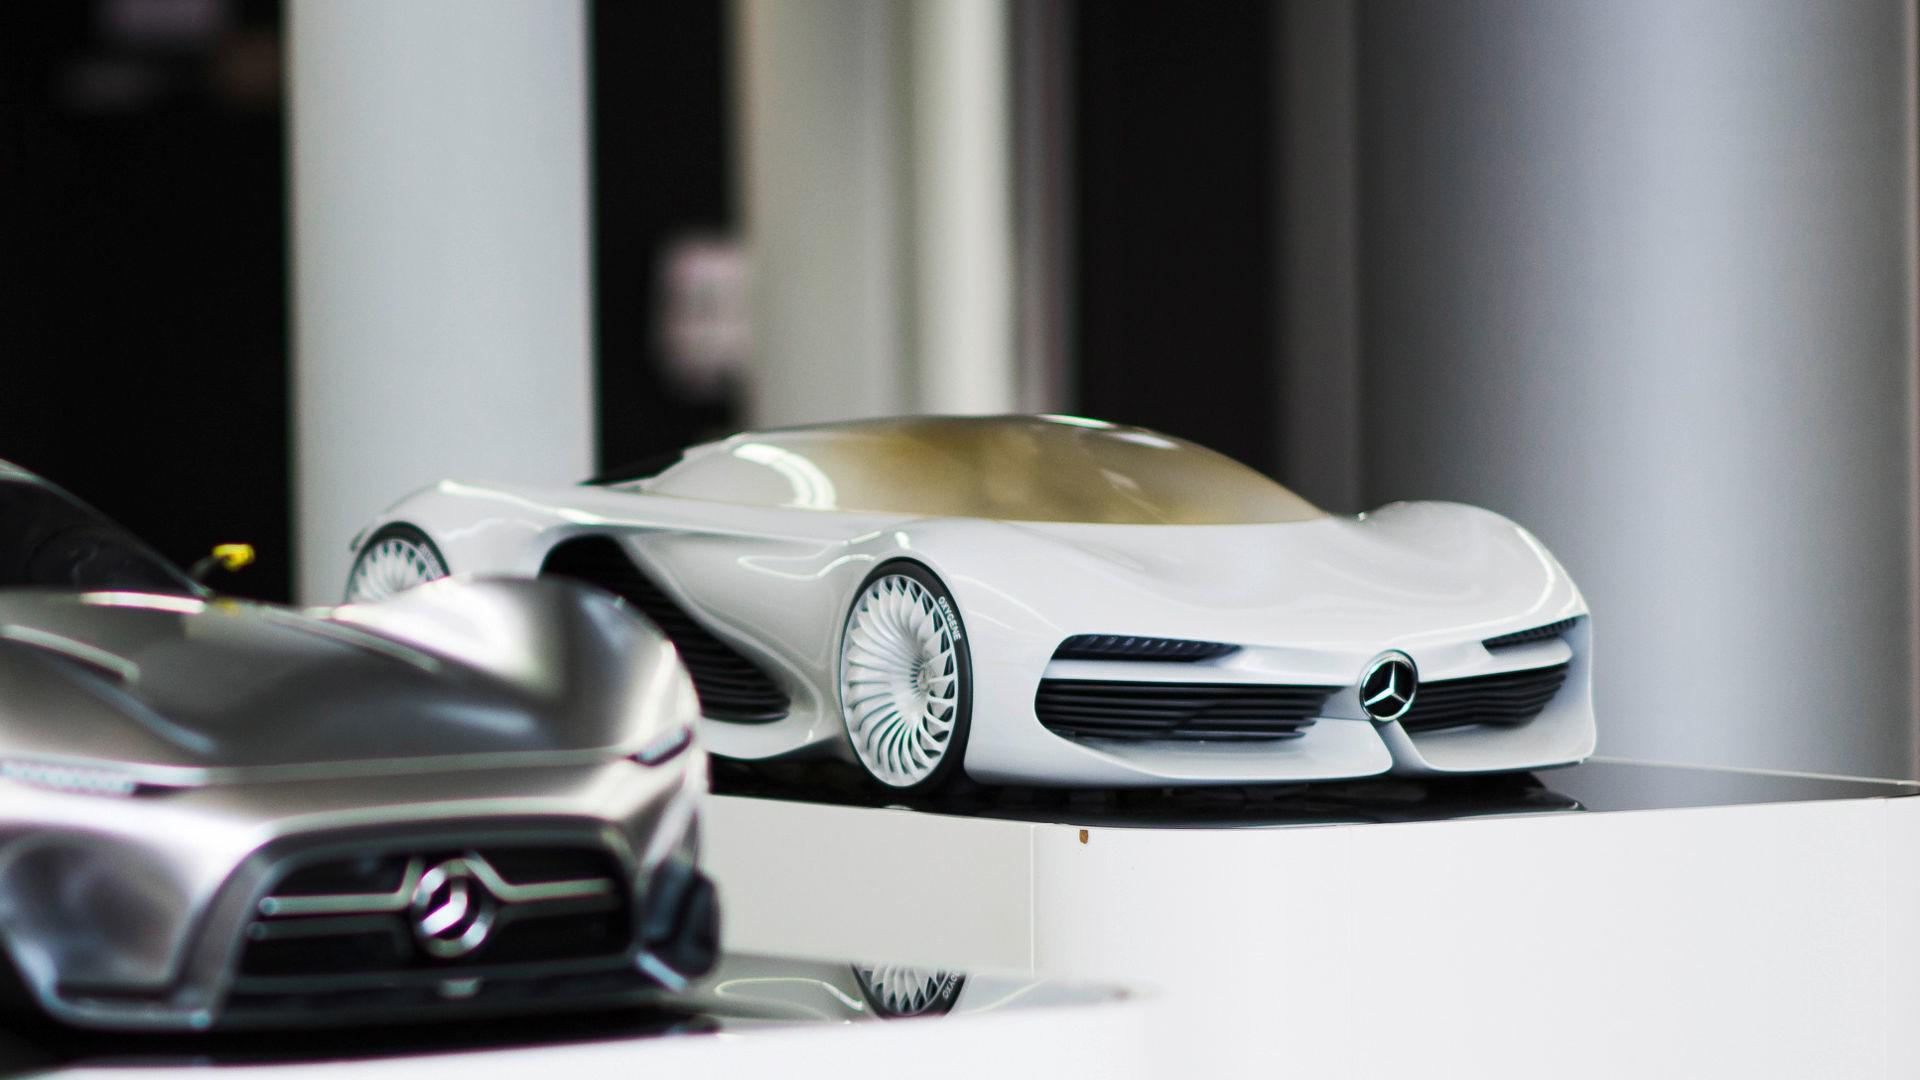 les-etudes-de-design-hypercar-mercedes-amg-project-one-195-1.jpg